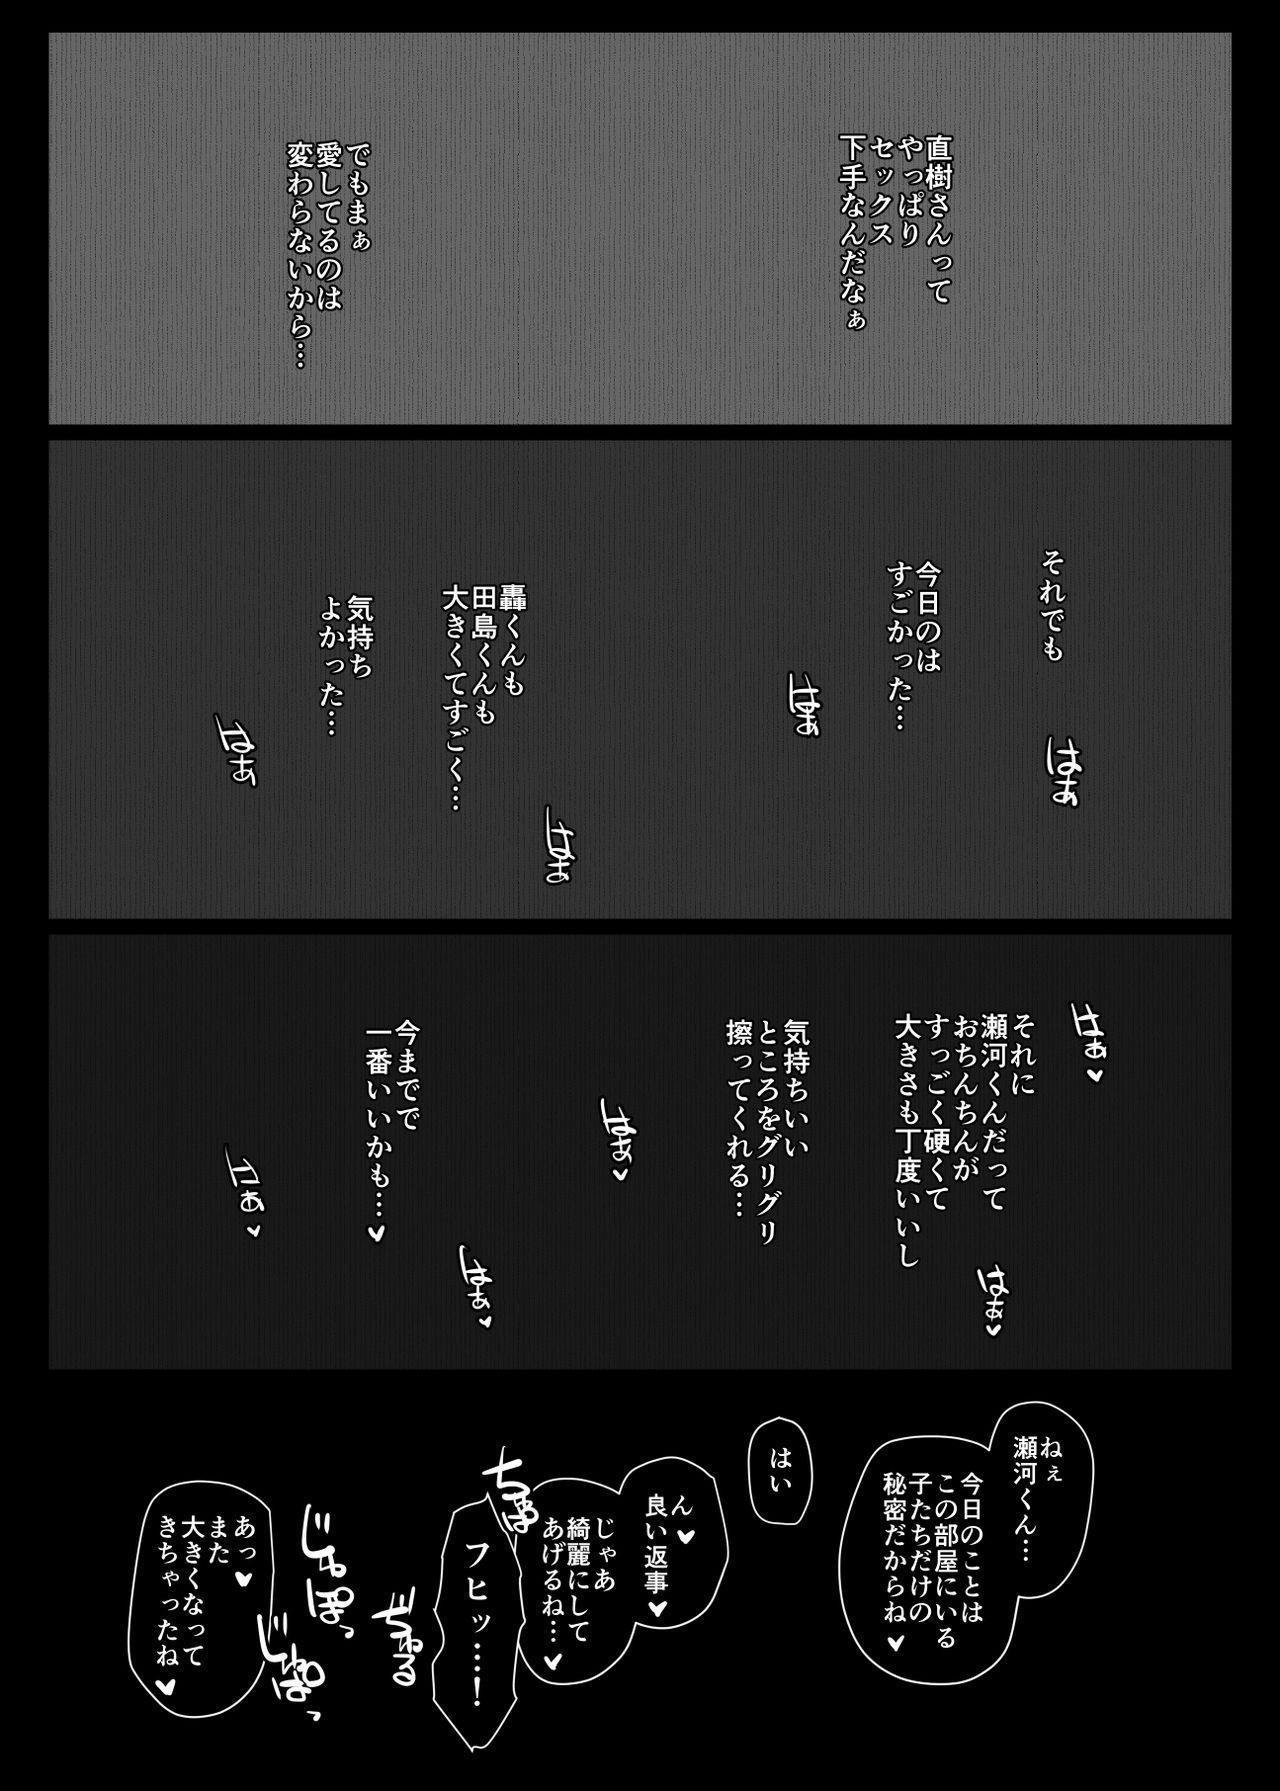 Hitozuma Kyoushi NTR Shuugakuryokou 64